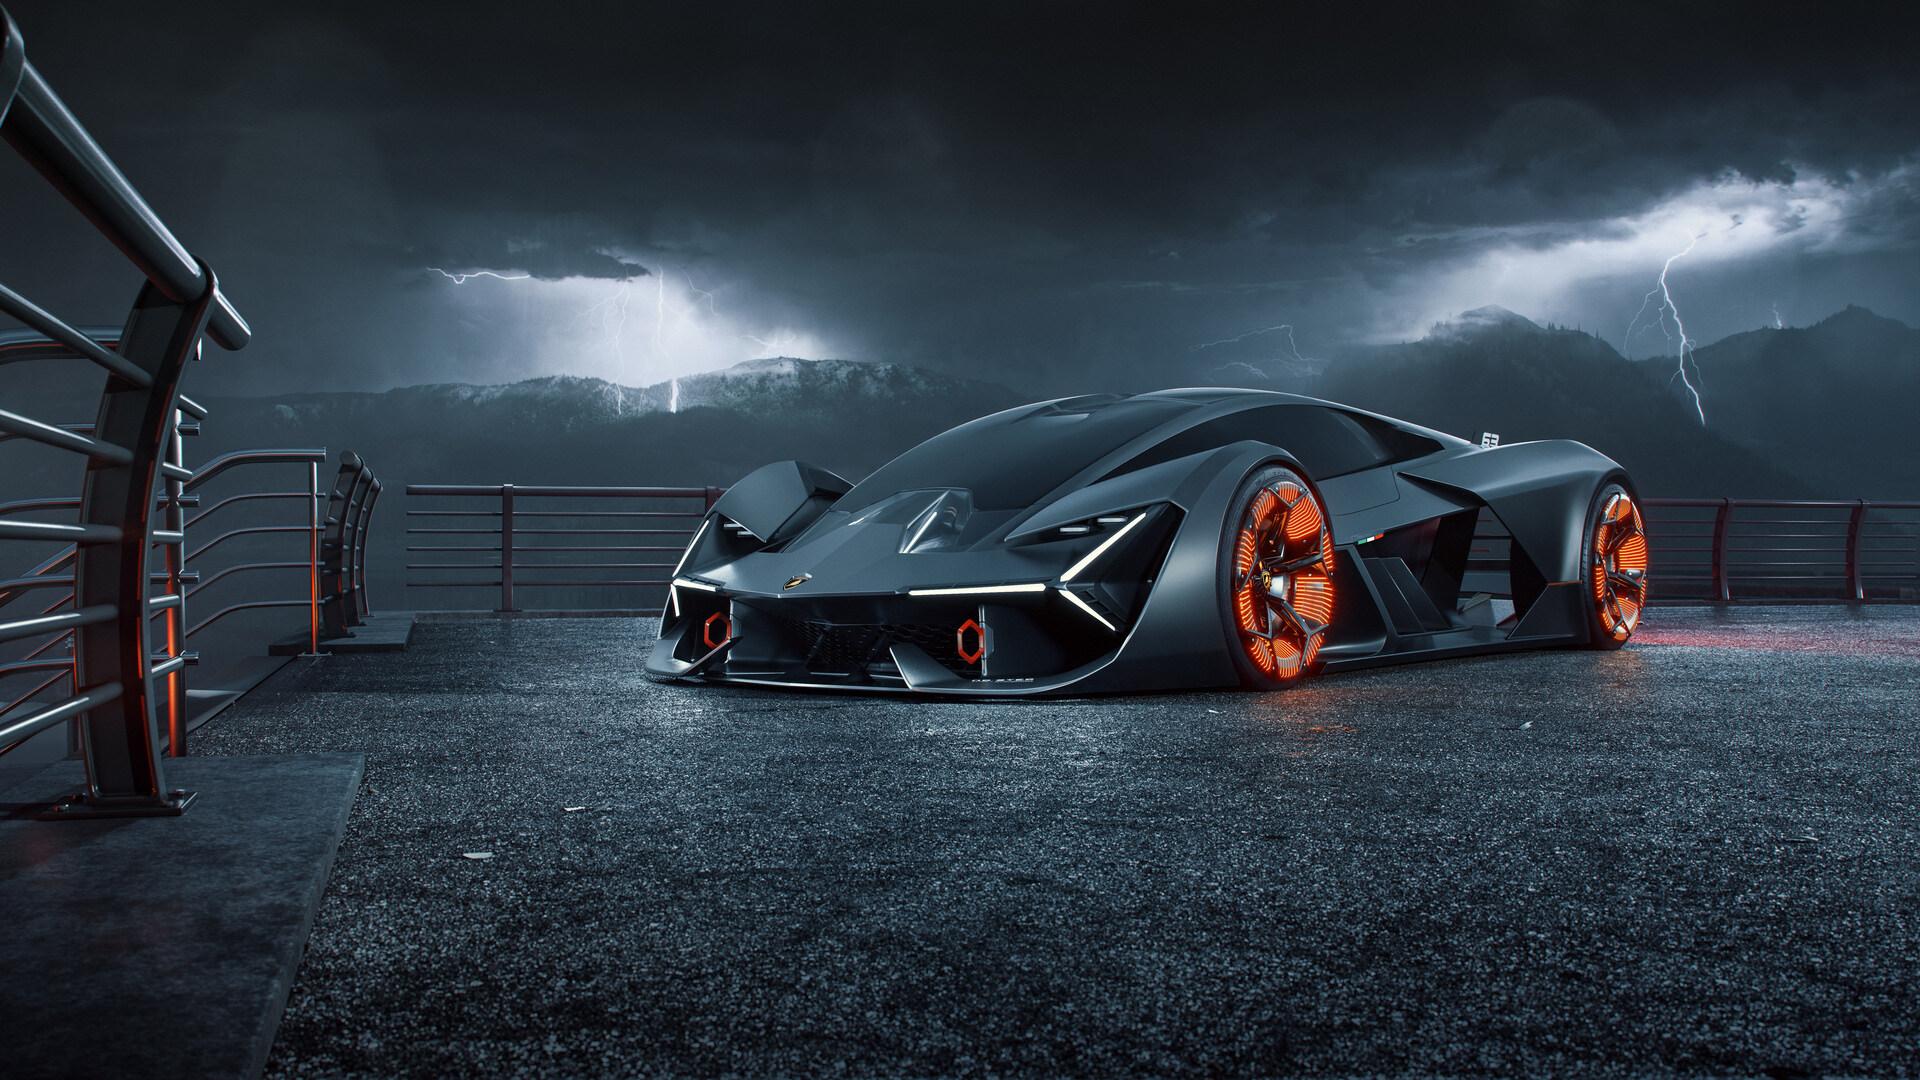 1920x1080 Lamborghini Terzo Millennio Digital Art 2019 ...